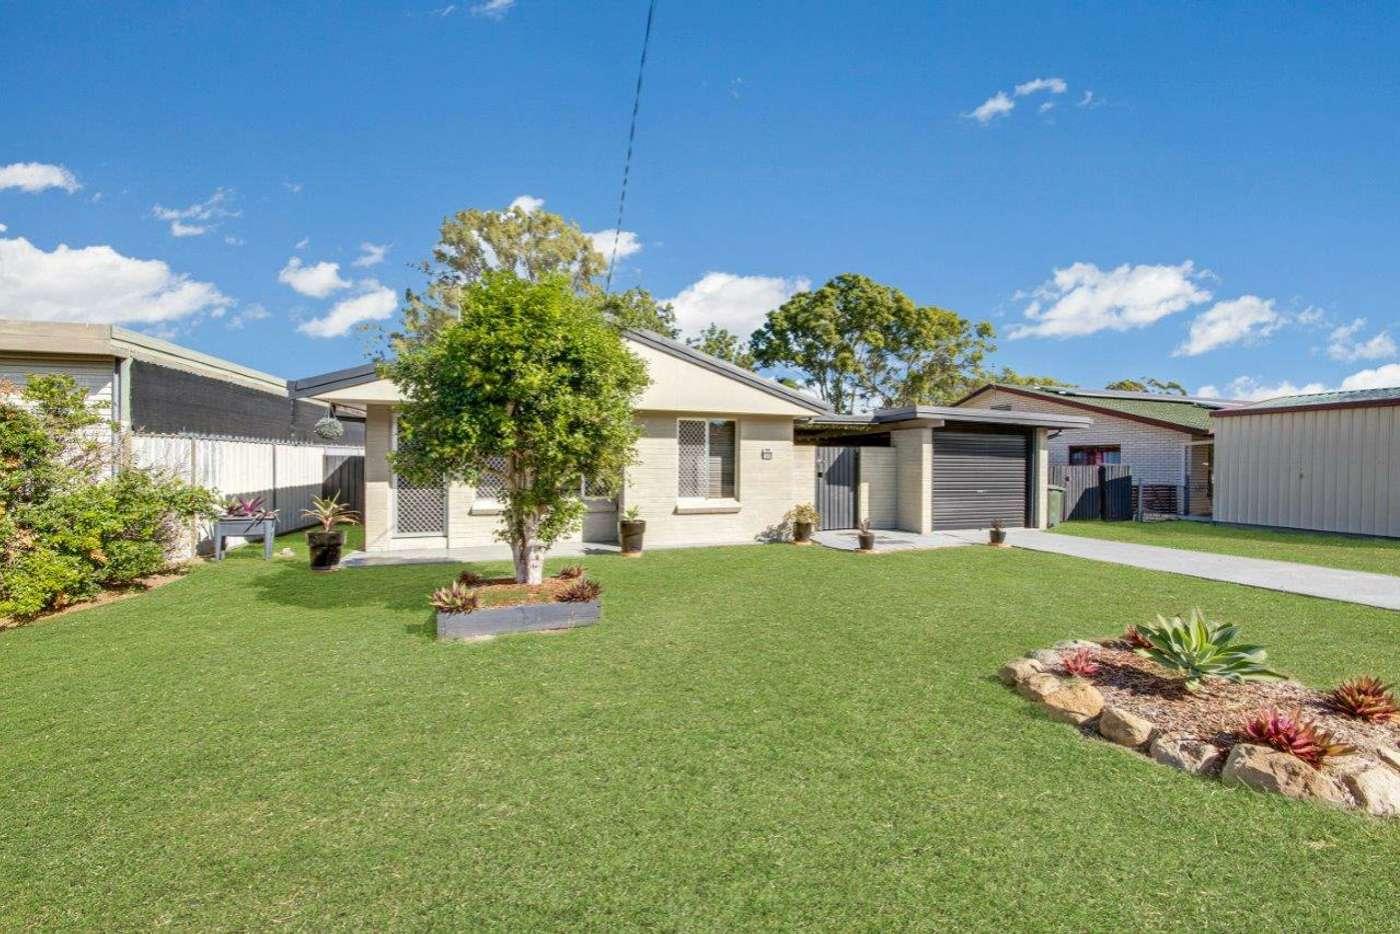 Main view of Homely house listing, 14 Cedrela Street, Kin Kora QLD 4680